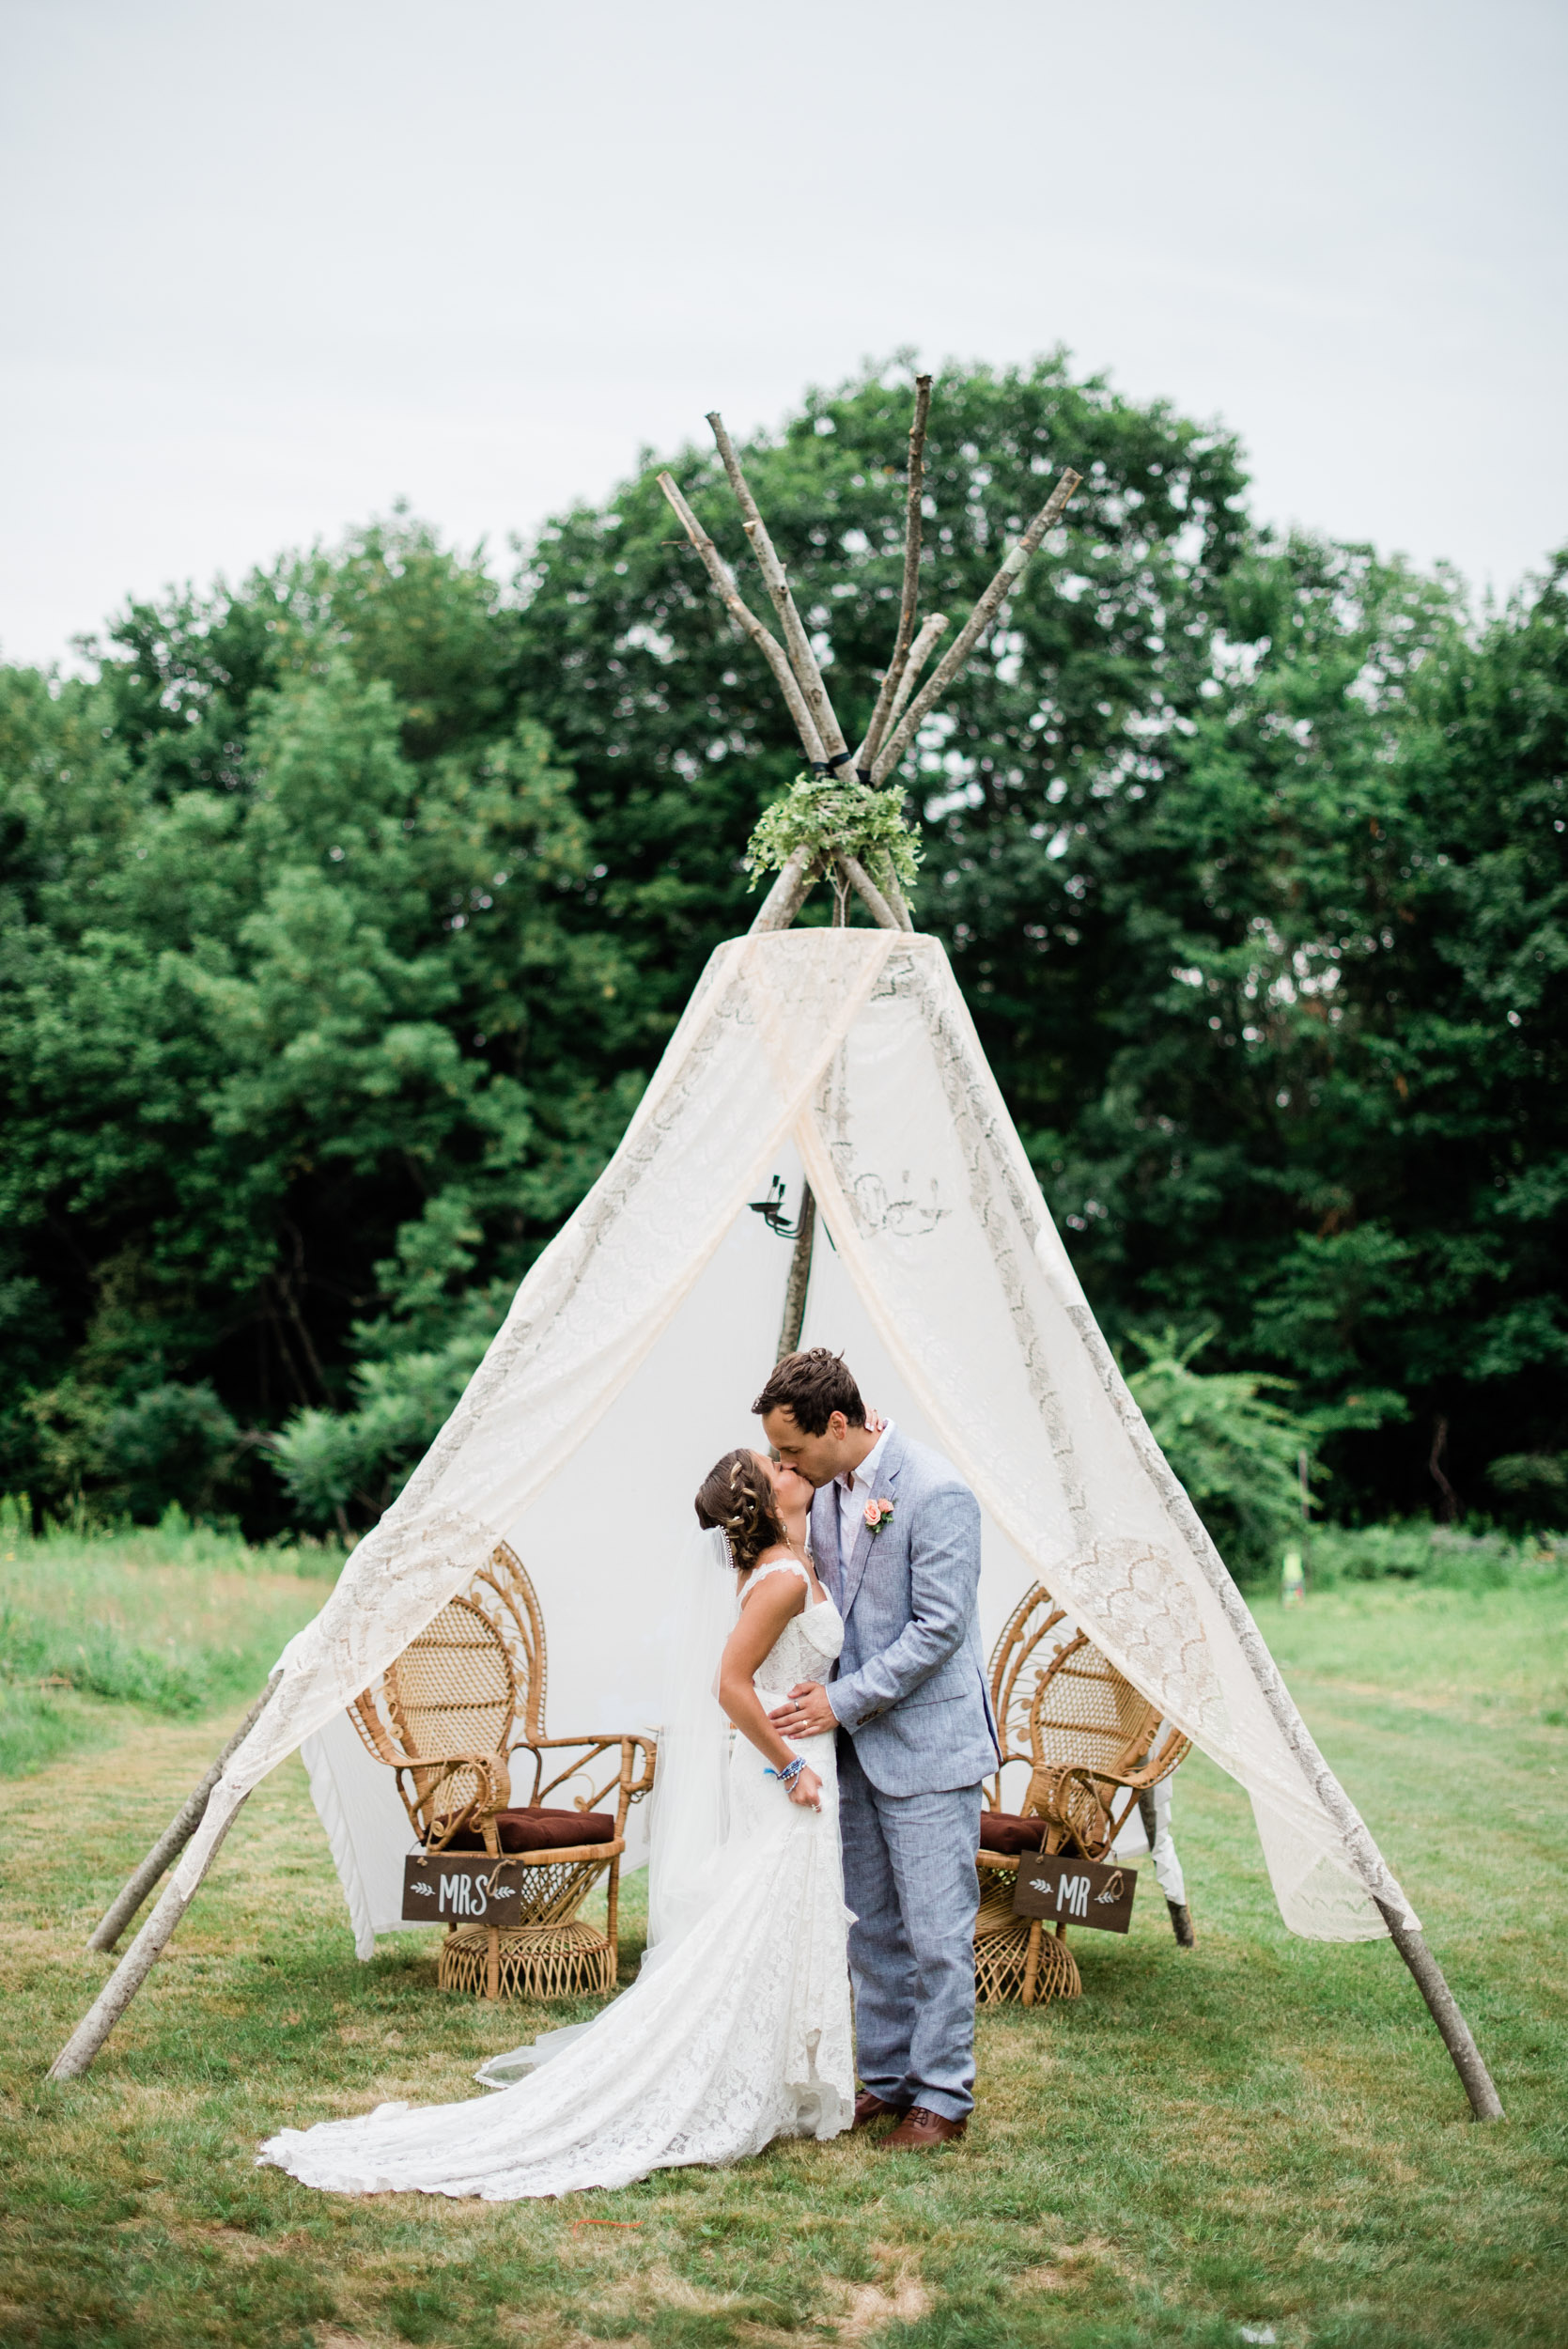 Wedding photography in Deerfield MA